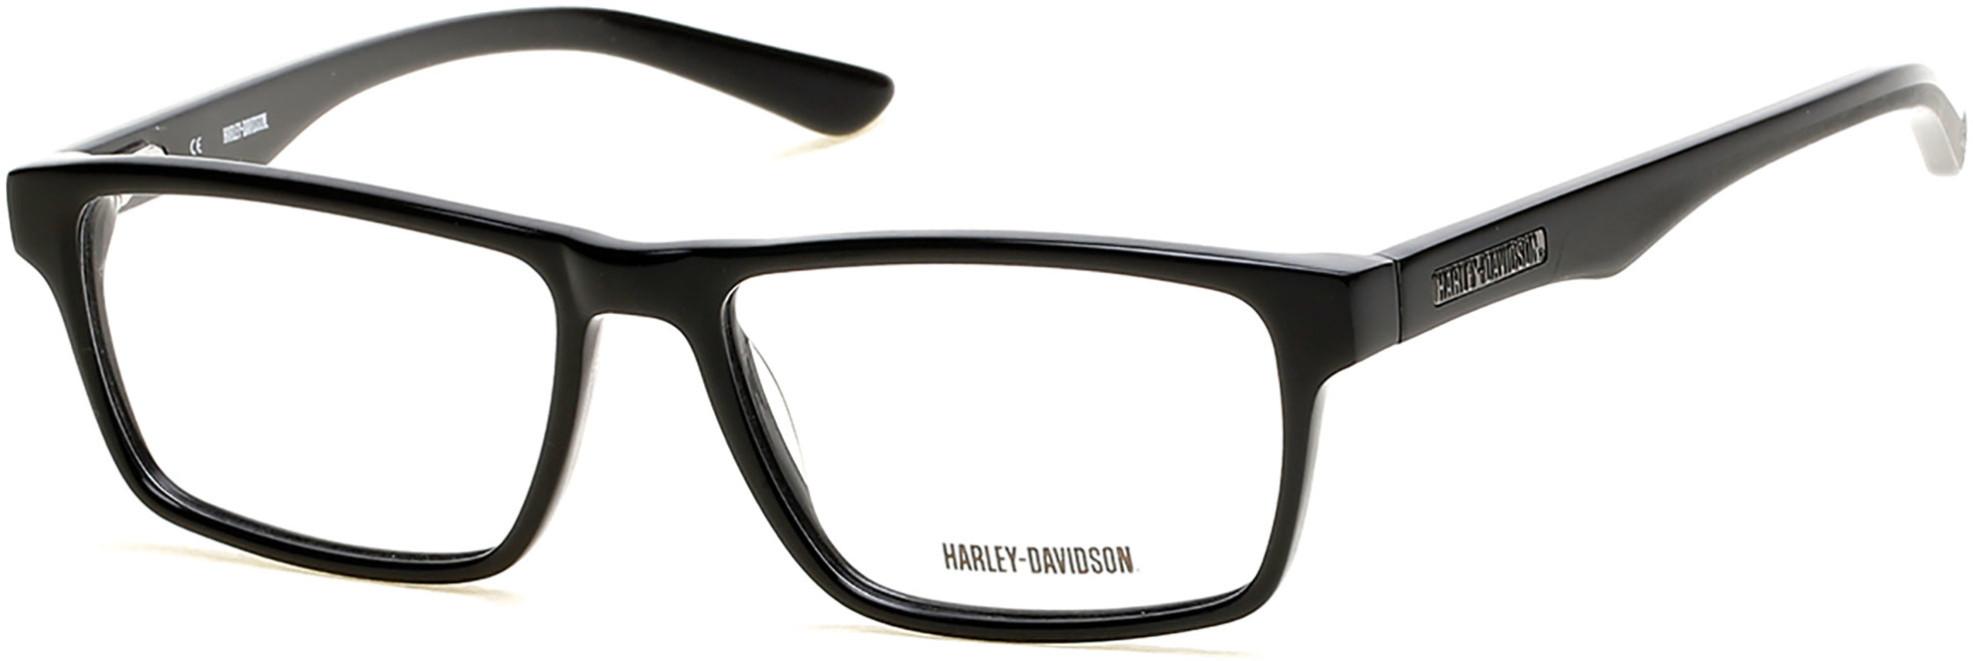 HARLEY-DAVIDSON HD0727 style-color 001 - Shiny Black